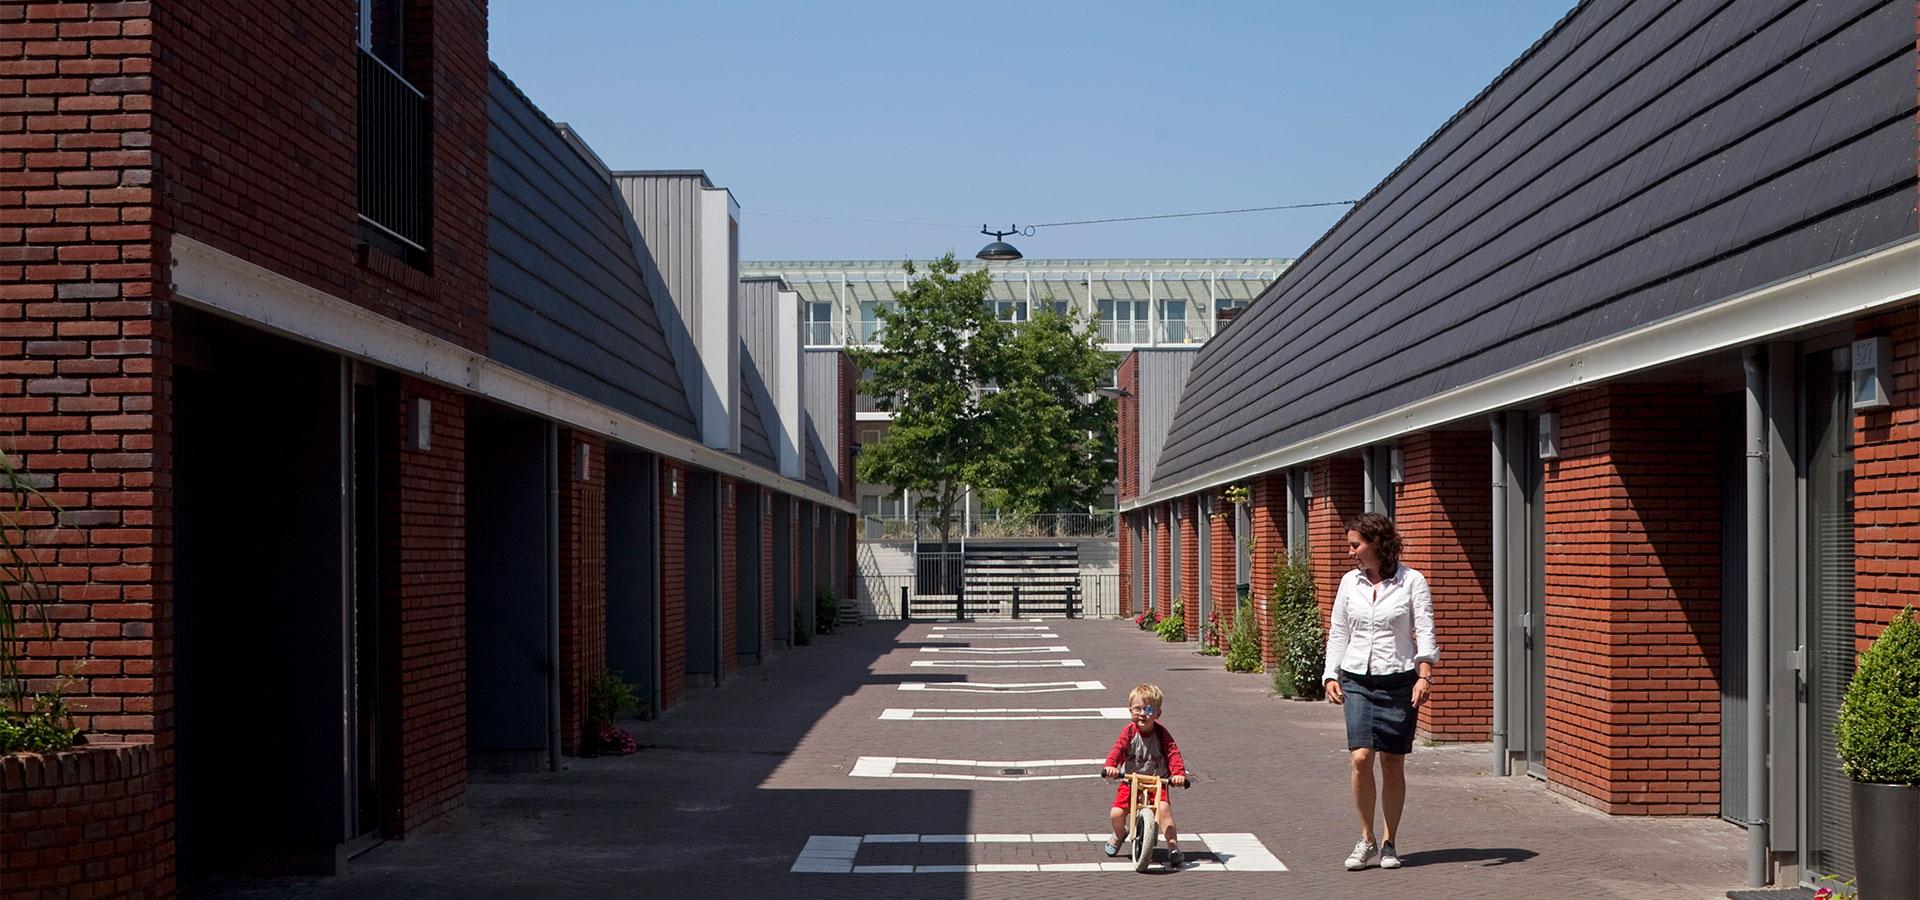 FARO architecten Blok 25 Haveneiland IJburg Amsterdam 08